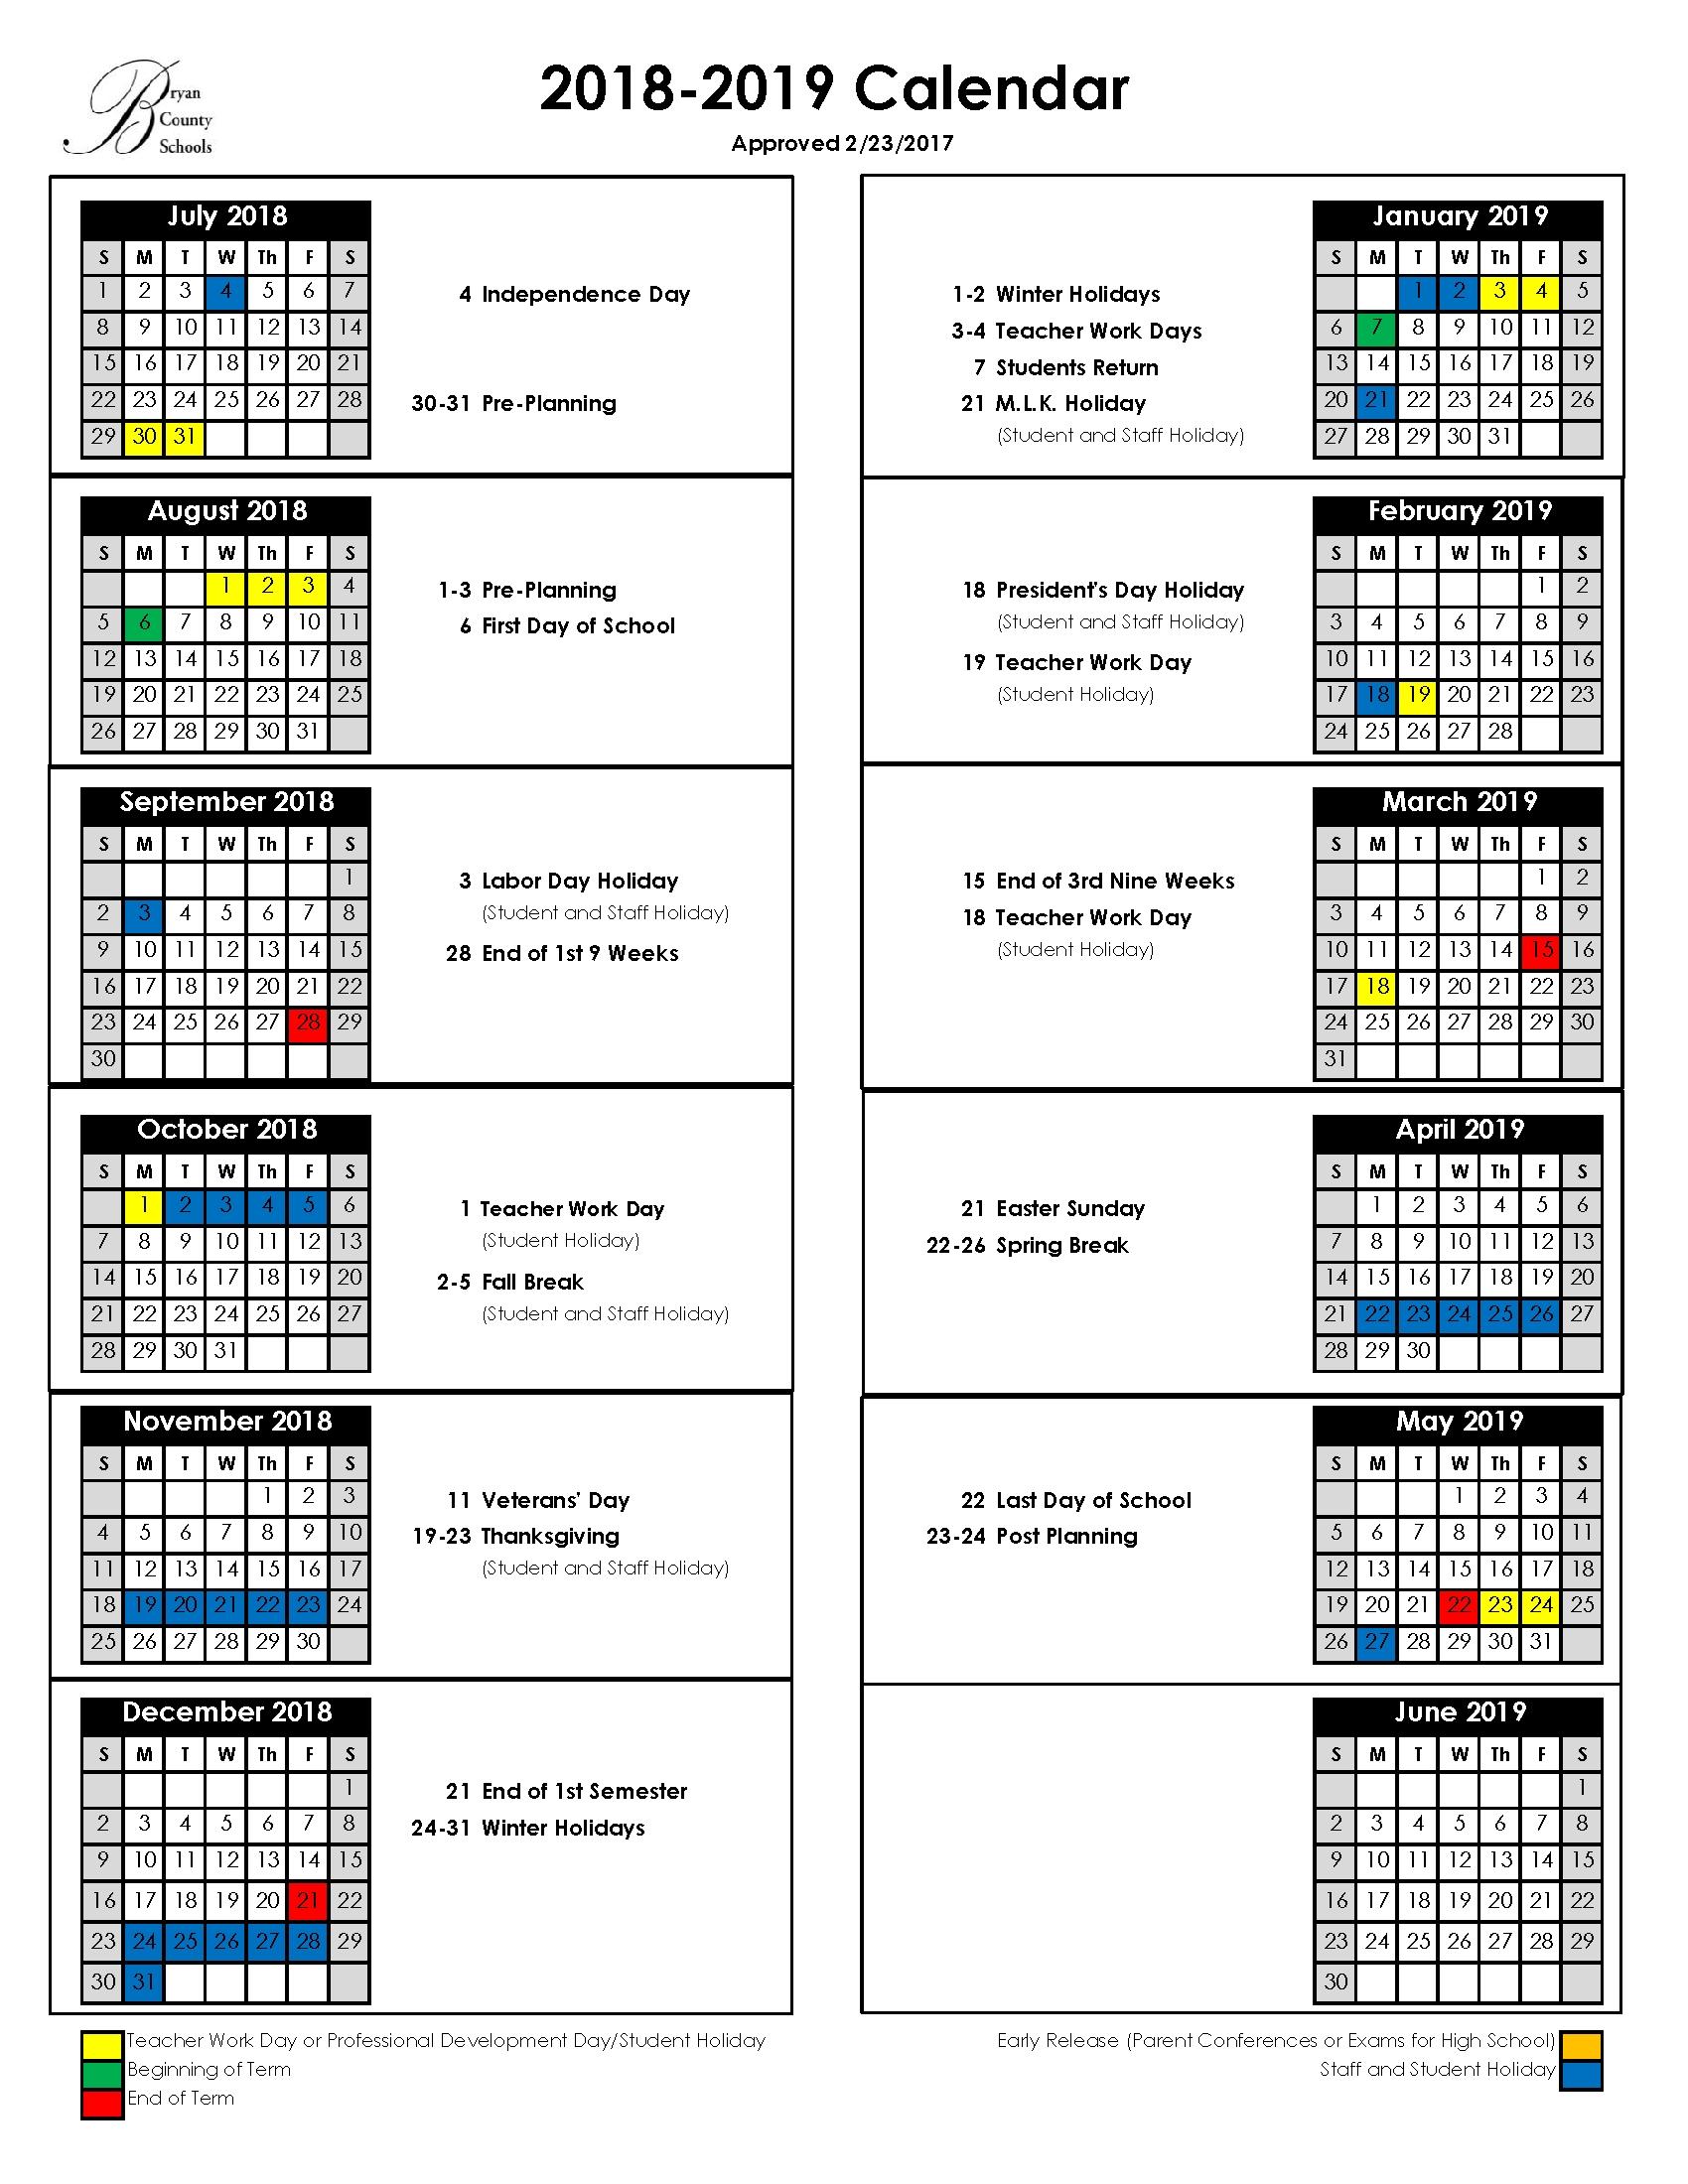 Bryan County Schools Calendar 2019-19